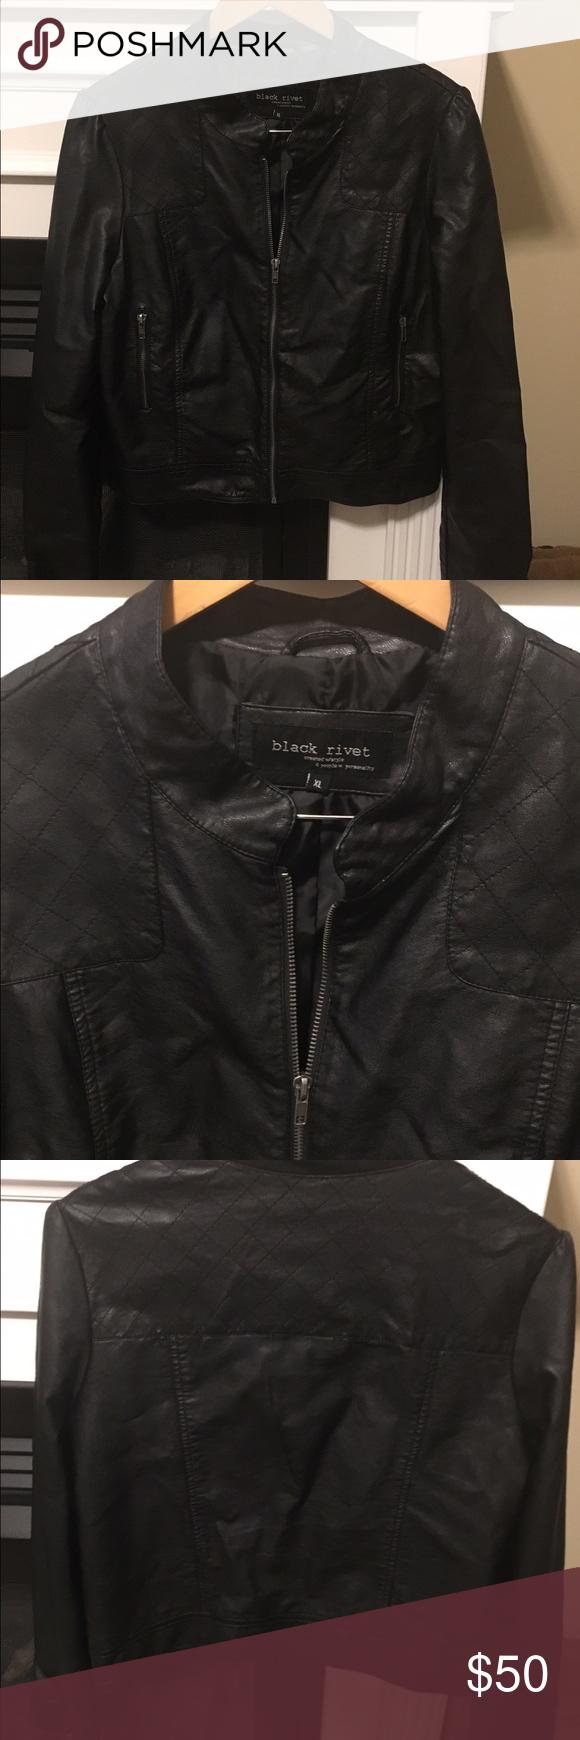 Leather jacket xl size - Wilson S Black Rivet Leather Jacket Xl Black Leather Worn Once Mint Condition Xl In Size Black Rivet Jackets Coats